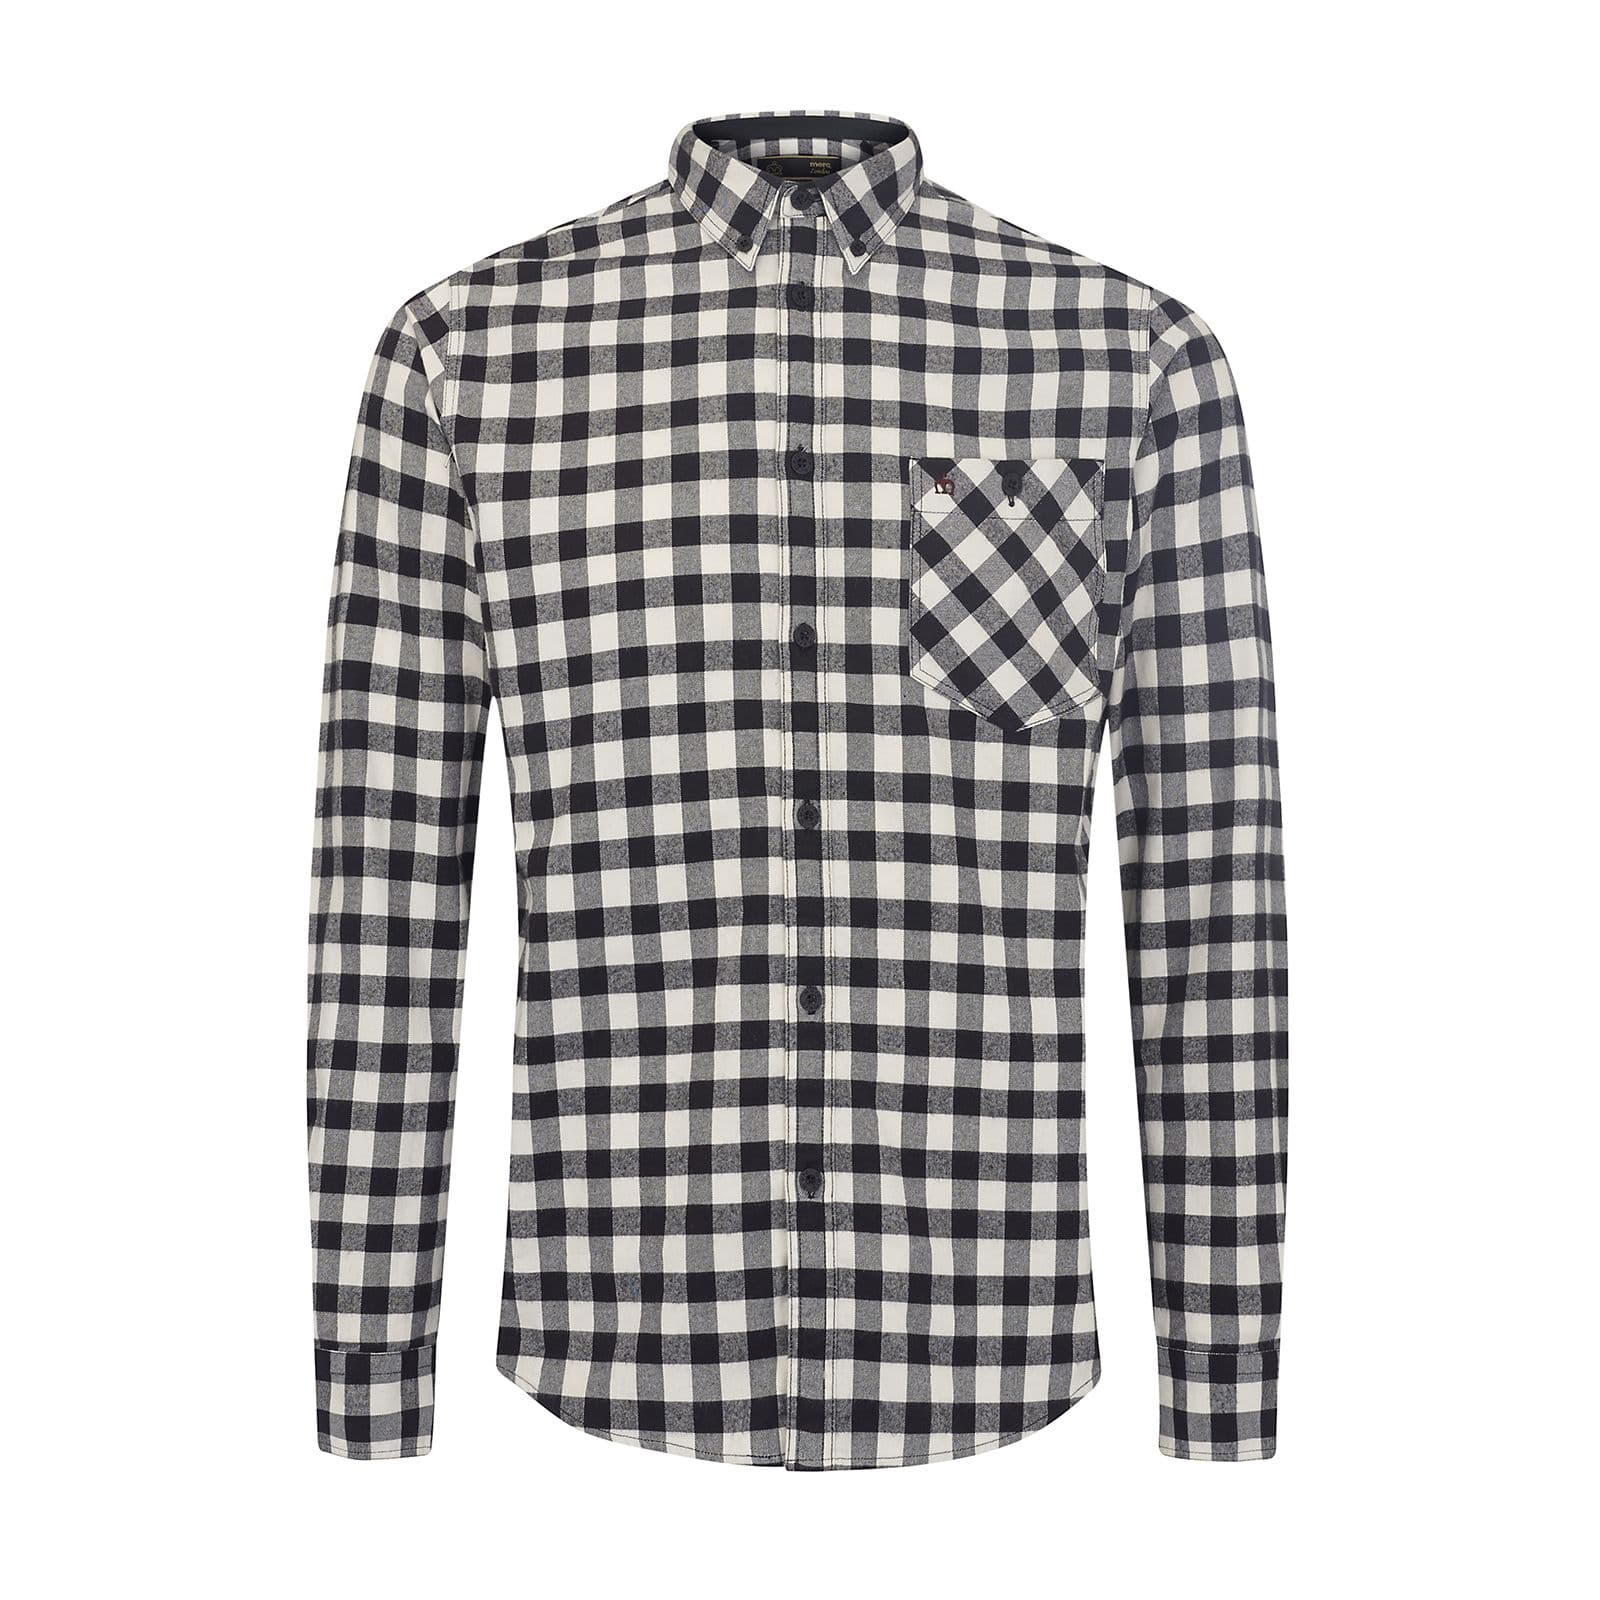 Рубашка FoxhillRude Boy by Merc<br><br><br>Артикул: 1516212<br>Материал: 100% хлопок<br>Цвет: черно-белая клетка<br>Пол: Мужской